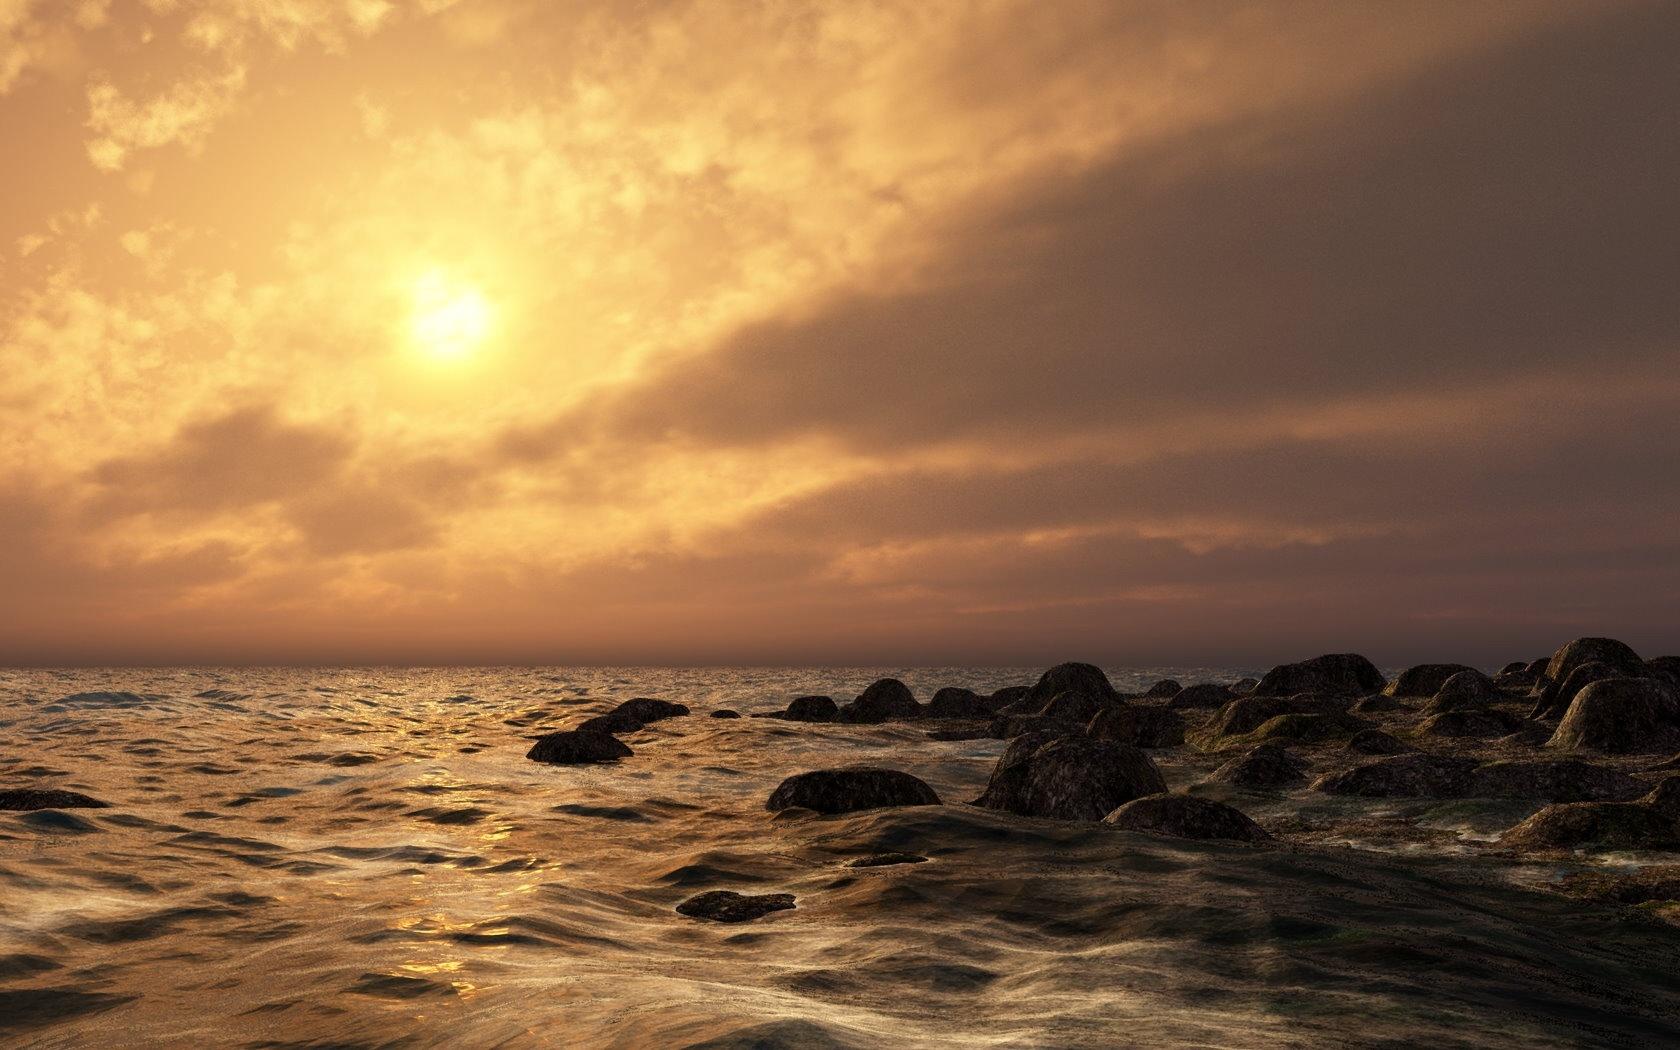 Evening sea nature 1680 x 1050 download close